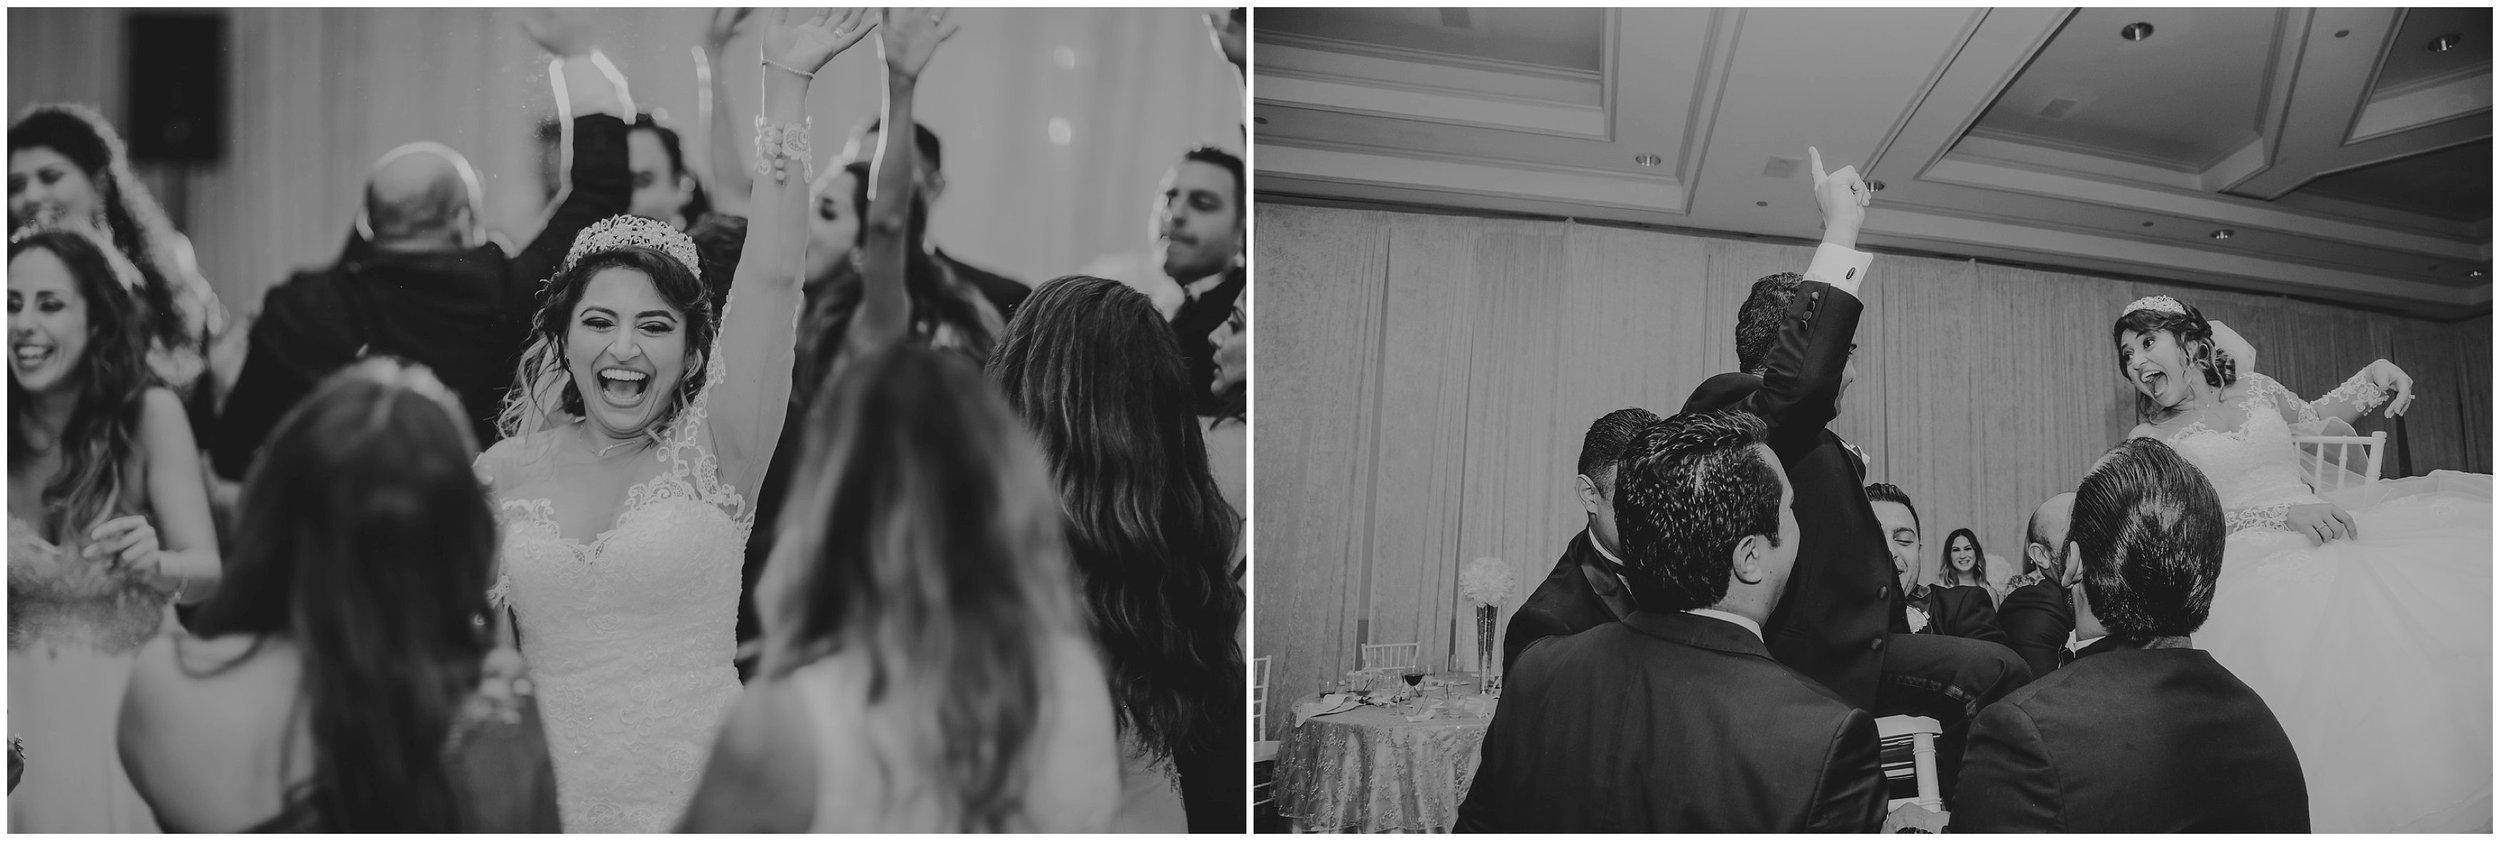 Le Cape Weddings- Destination Wedding Photography -ShayanandNikkie-649-X3_LuxuryDestinationPhotographer.jpg